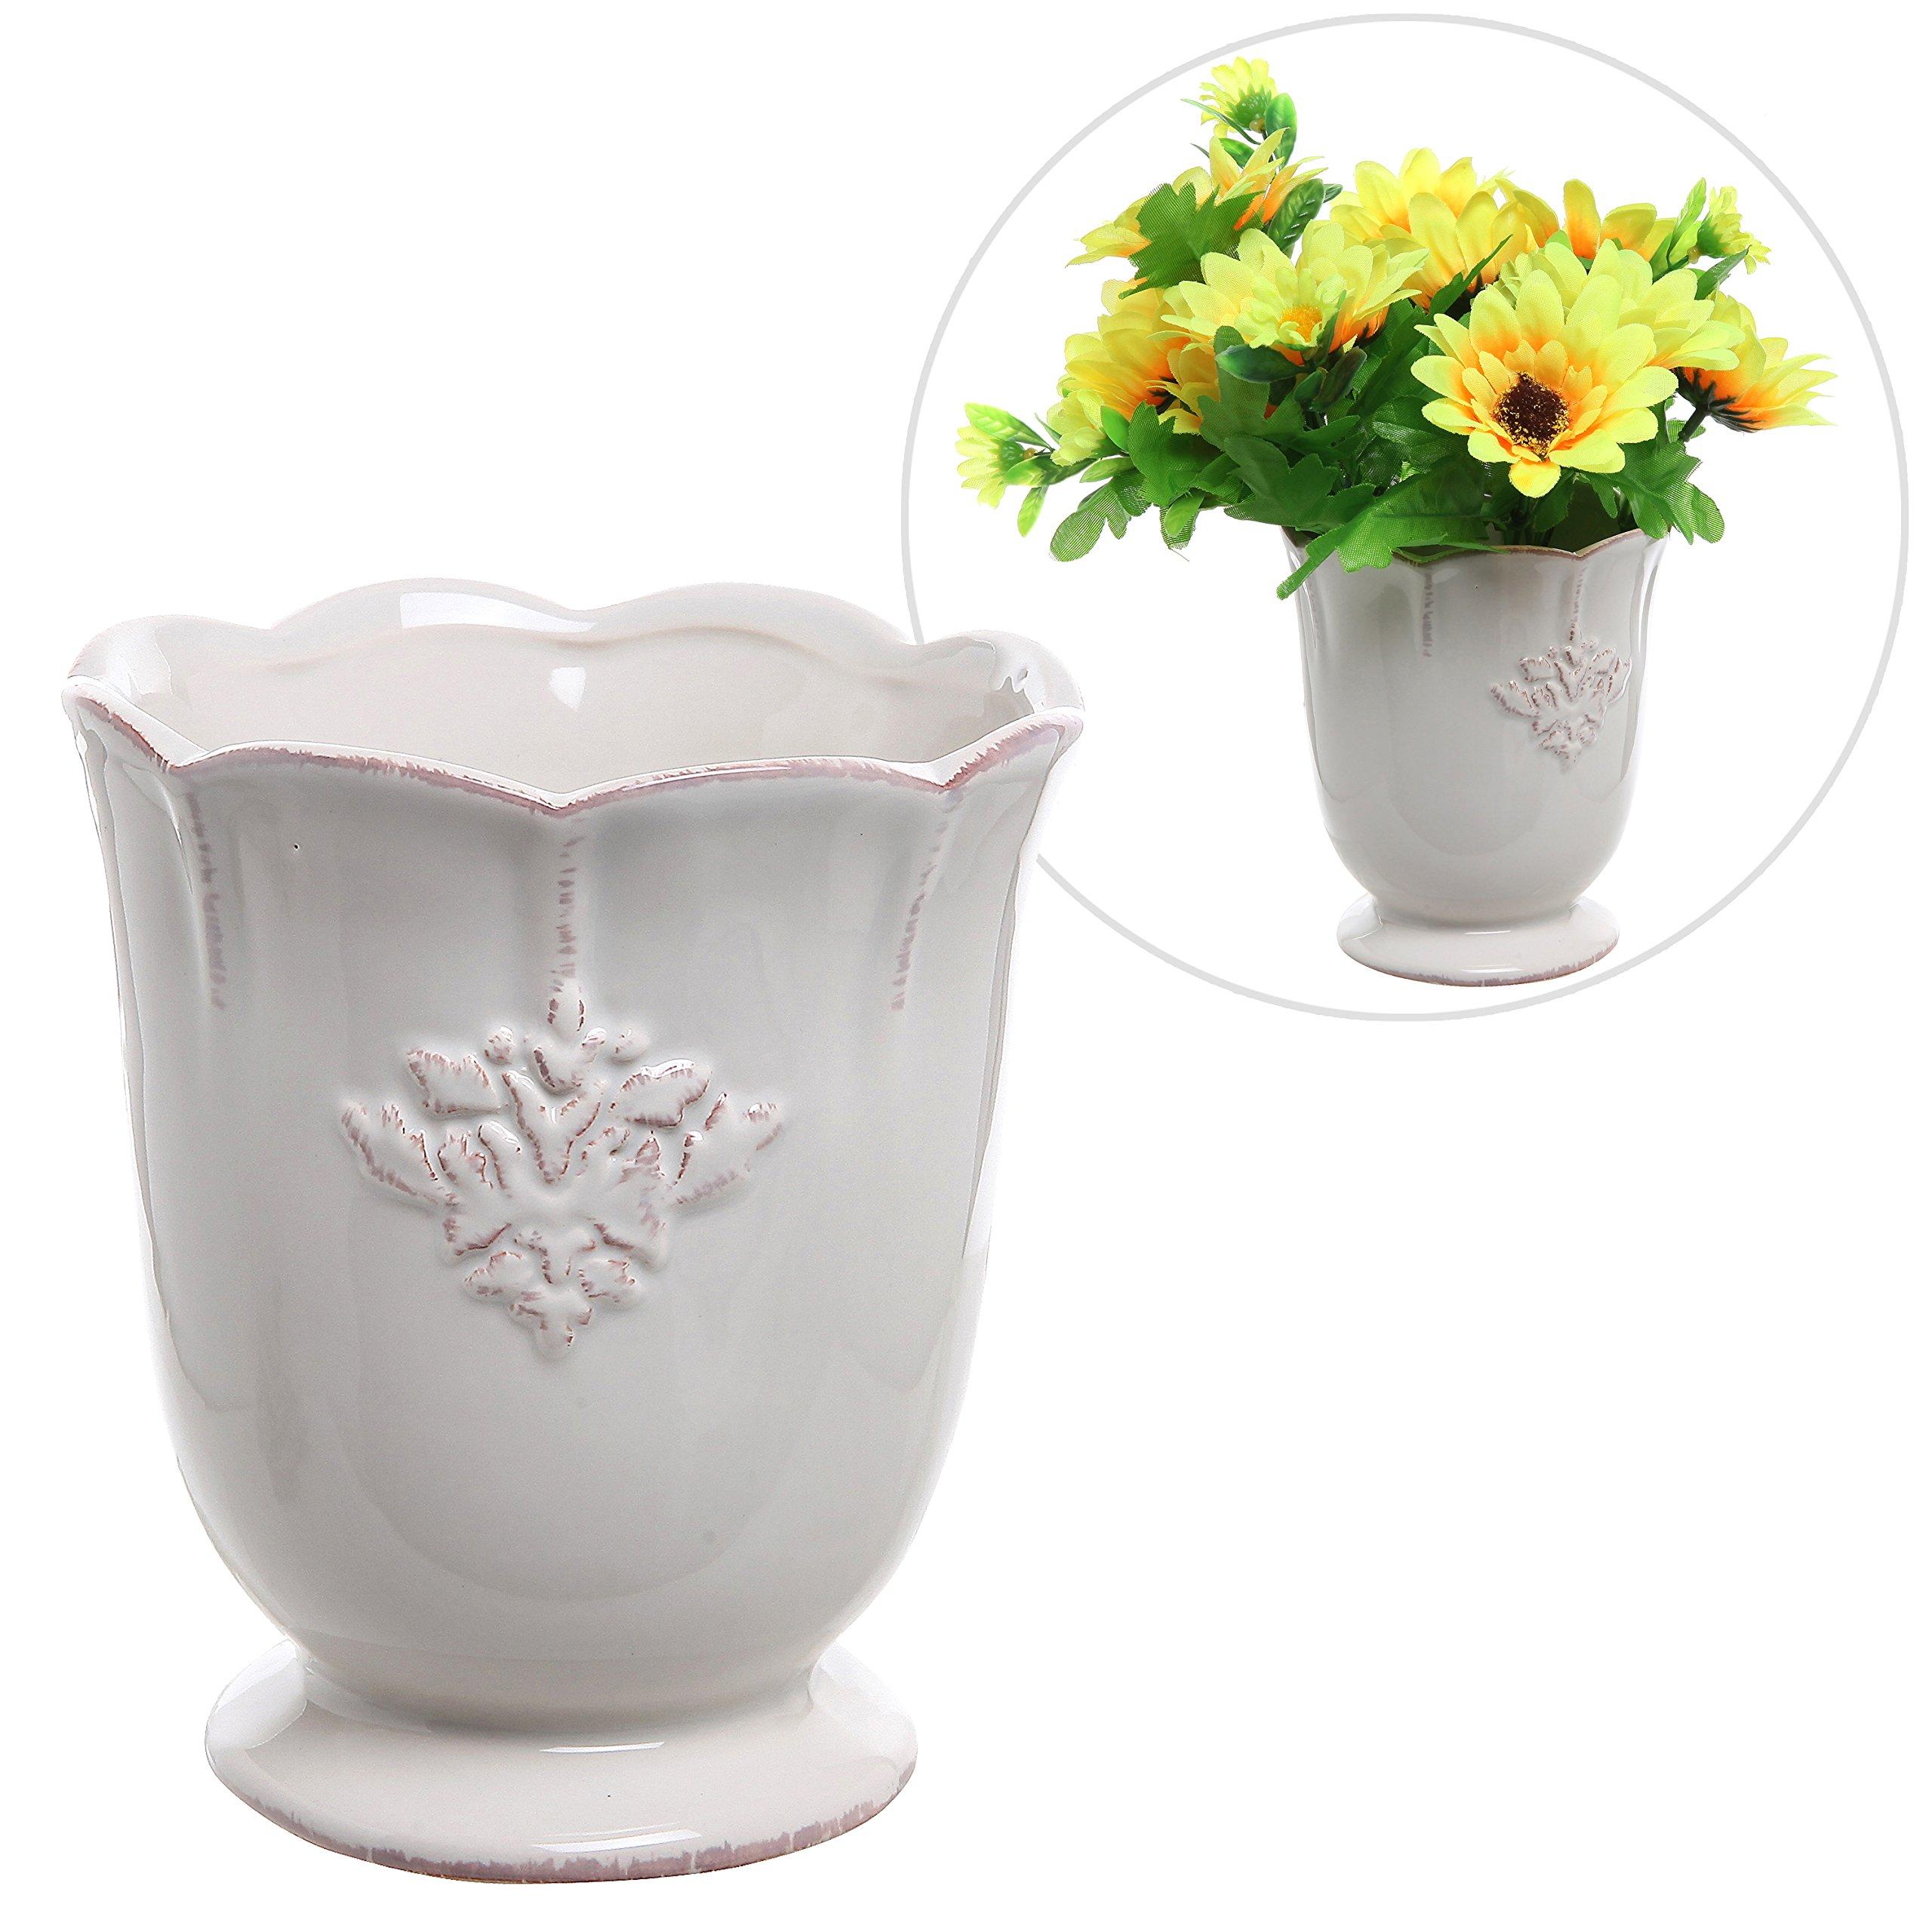 Buy french country design off white ceramic small decorative vase french country design off white ceramic small decorative vase succulent plant flower planter pot izmirmasajfo